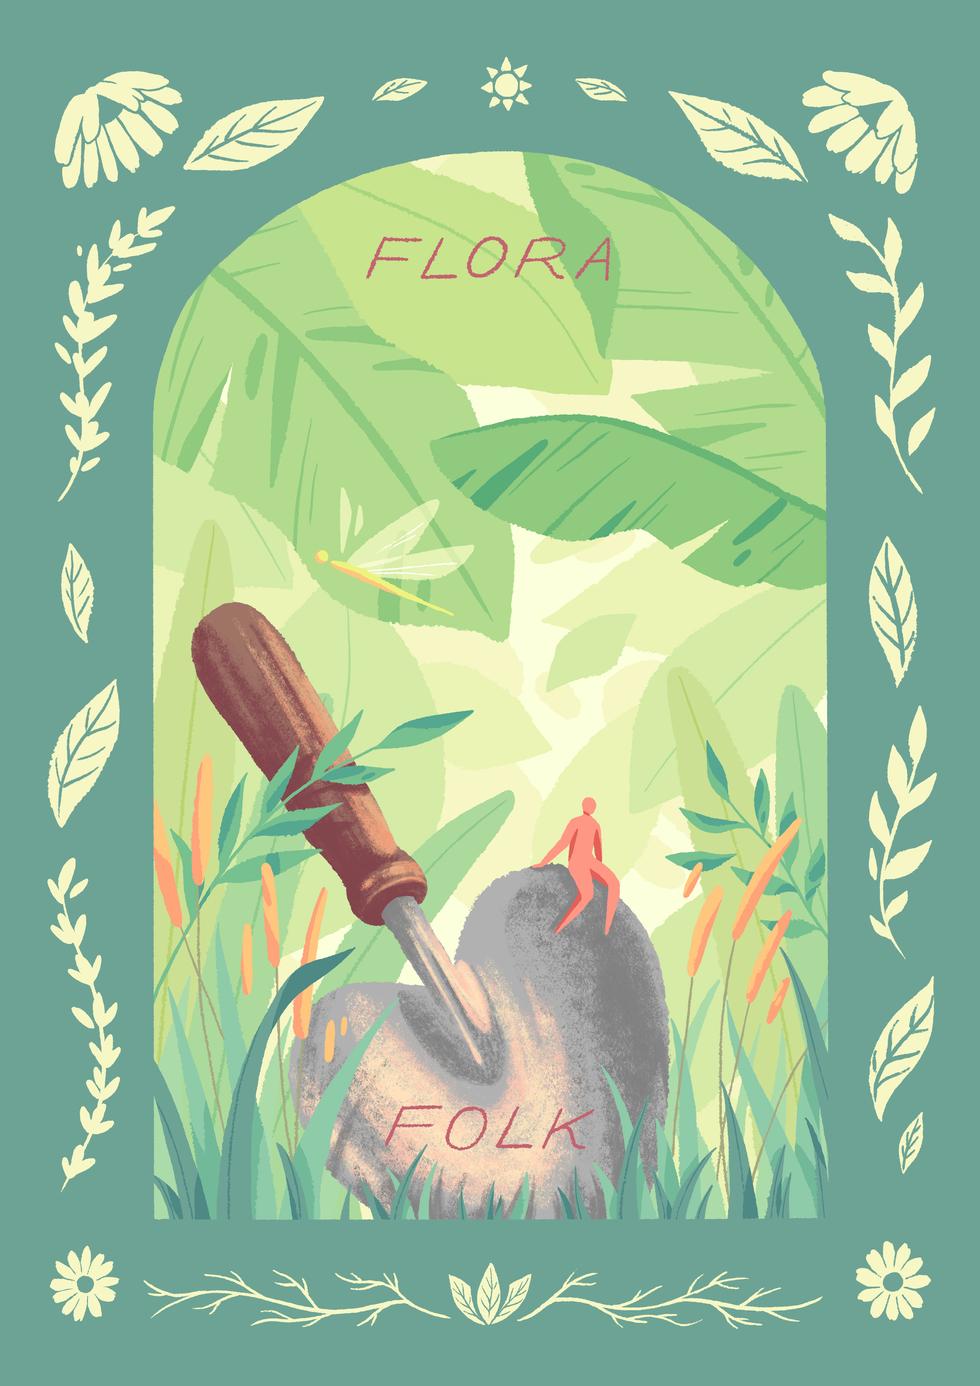 Flora Folk